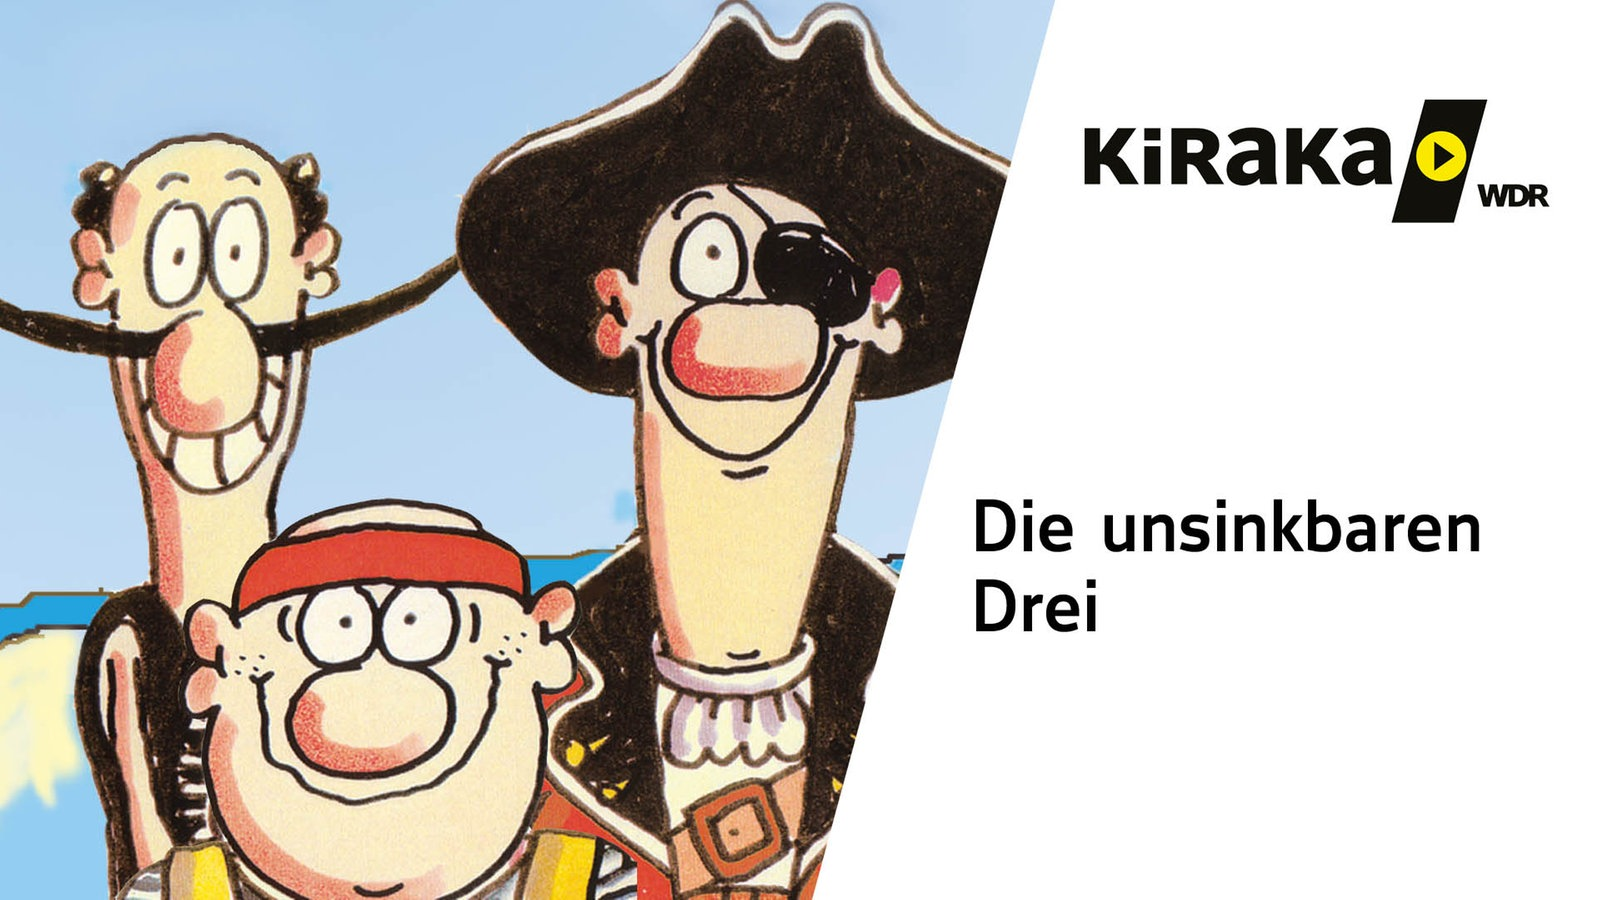 KiRaKa - Lachen - Lachen - Entdecken - Kinder